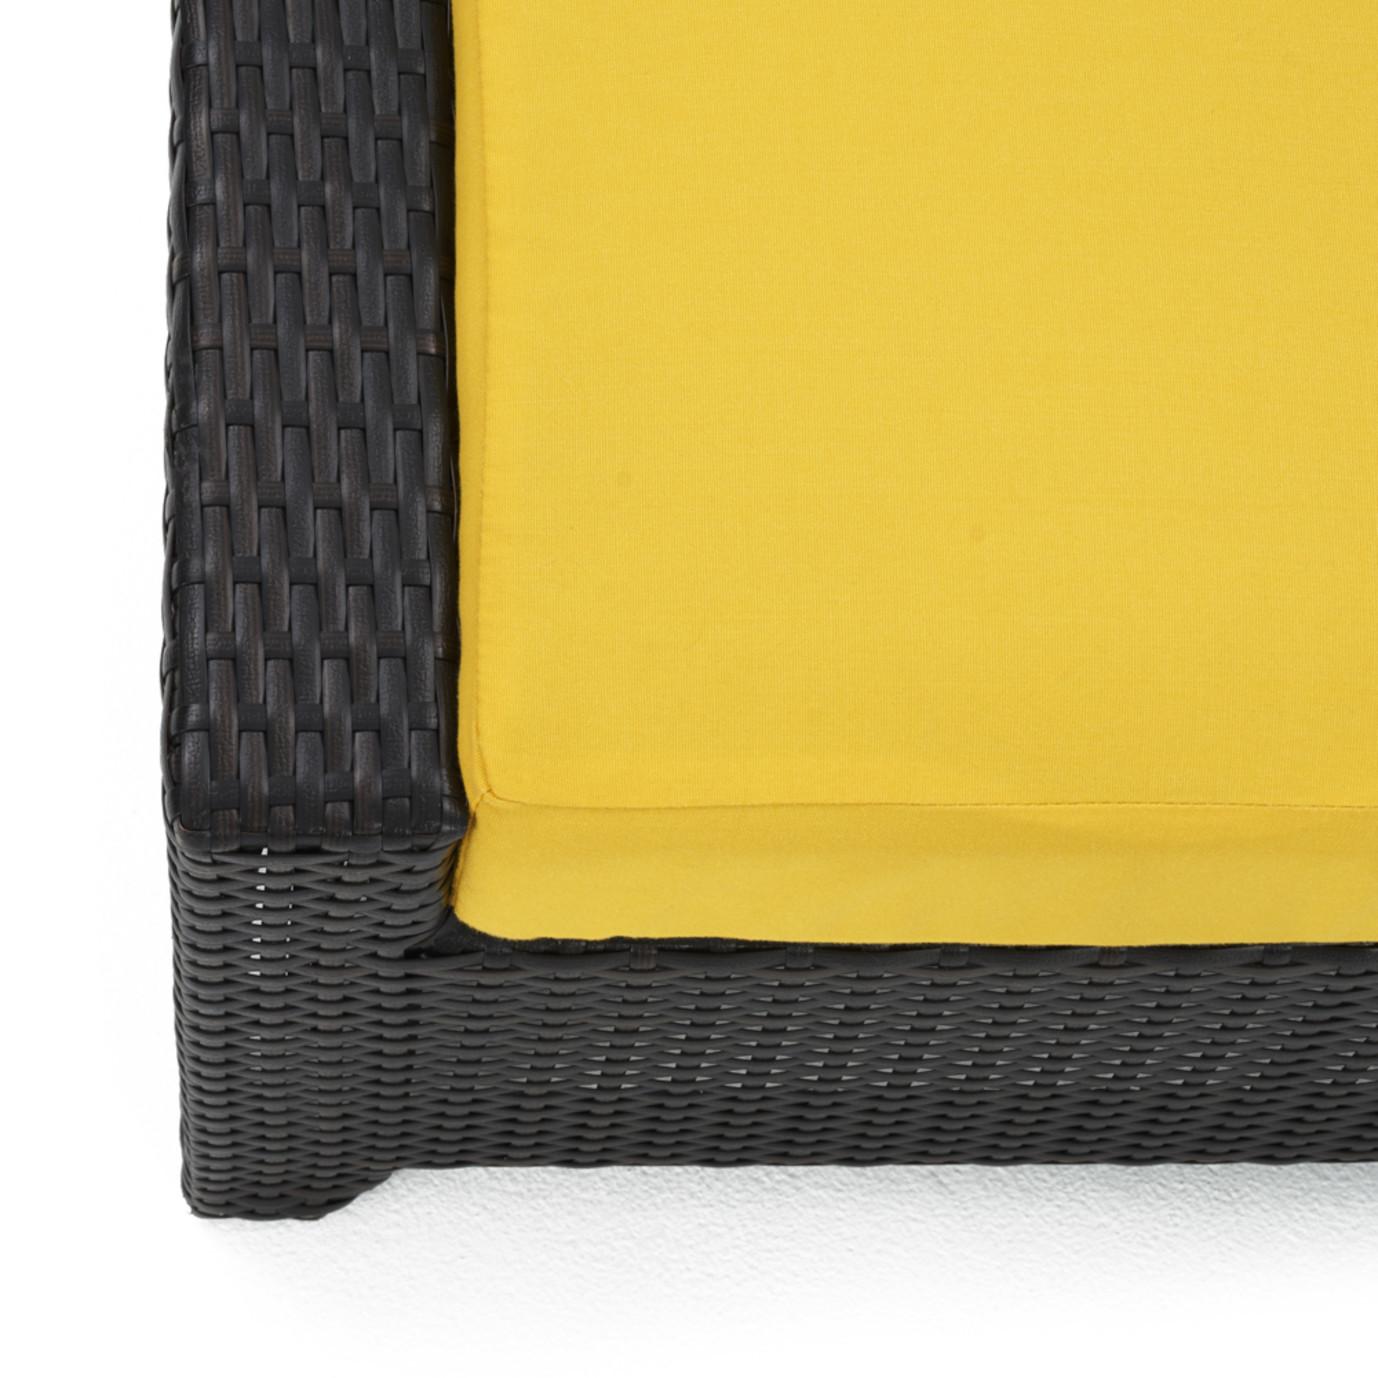 Deco™ 8pc Sofa & Club Chair Set - Sunflower Yellow